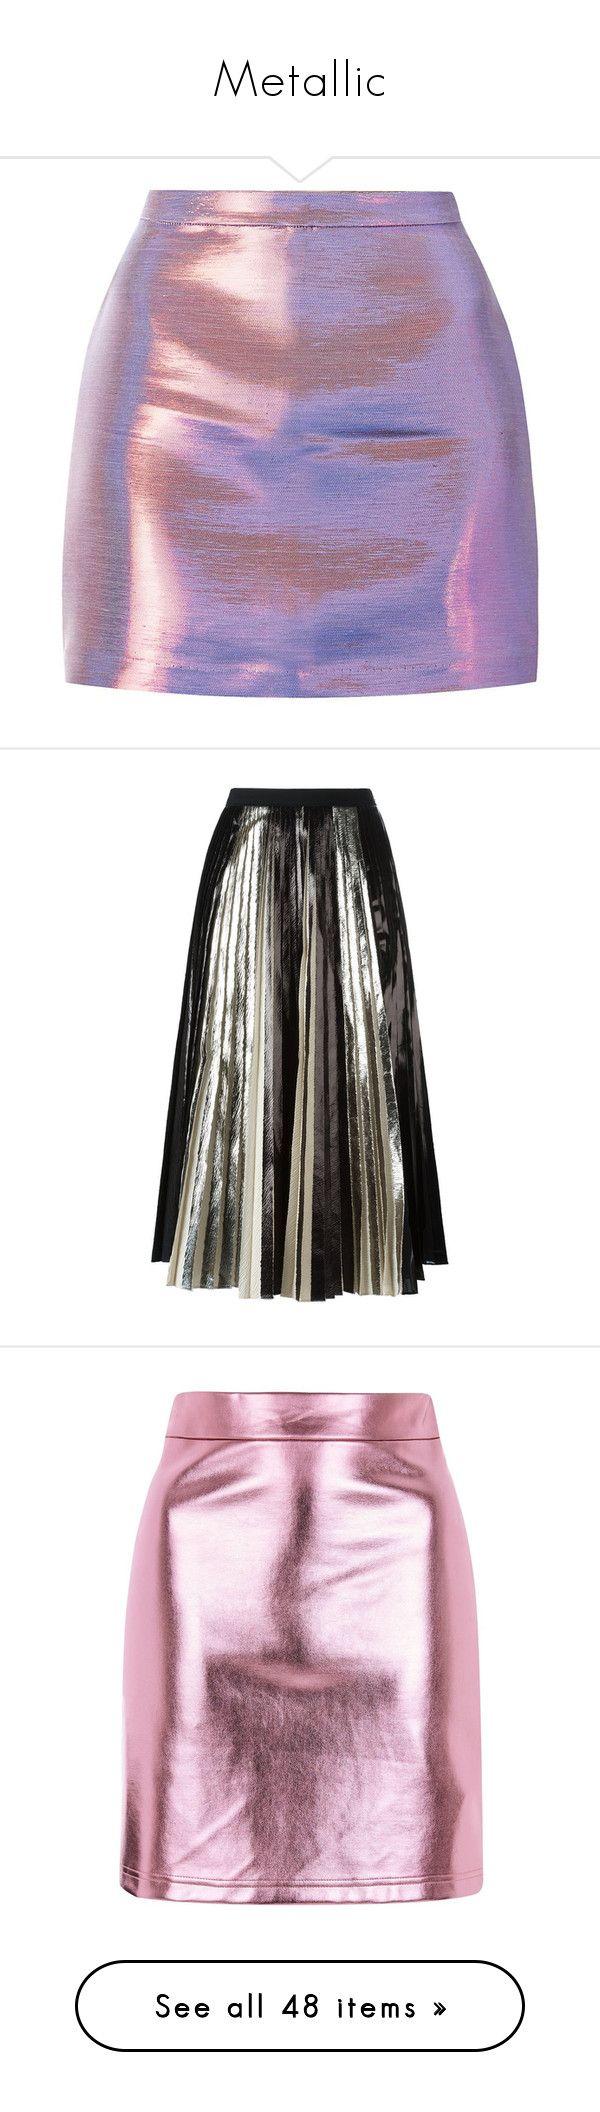 """Metallic"" by savemilkdrinkblood ❤ liked on Polyvore featuring skirts, mini skirts, bottoms, saias, faldas, zipper mini skirt, purple skirt, going out skirts, metallic mini skirt and shiny skirt"